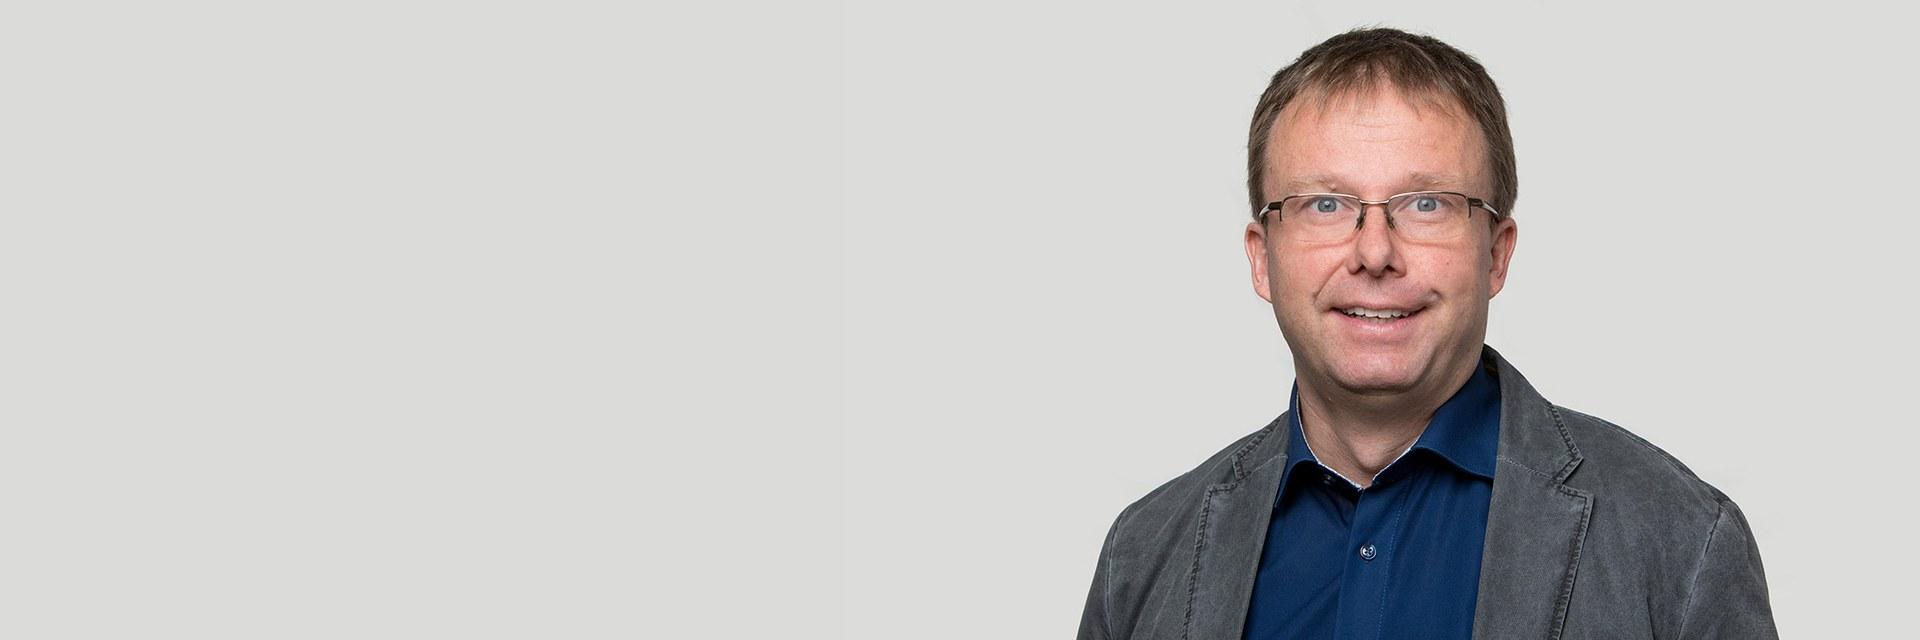 Dr. Christoph Mattes